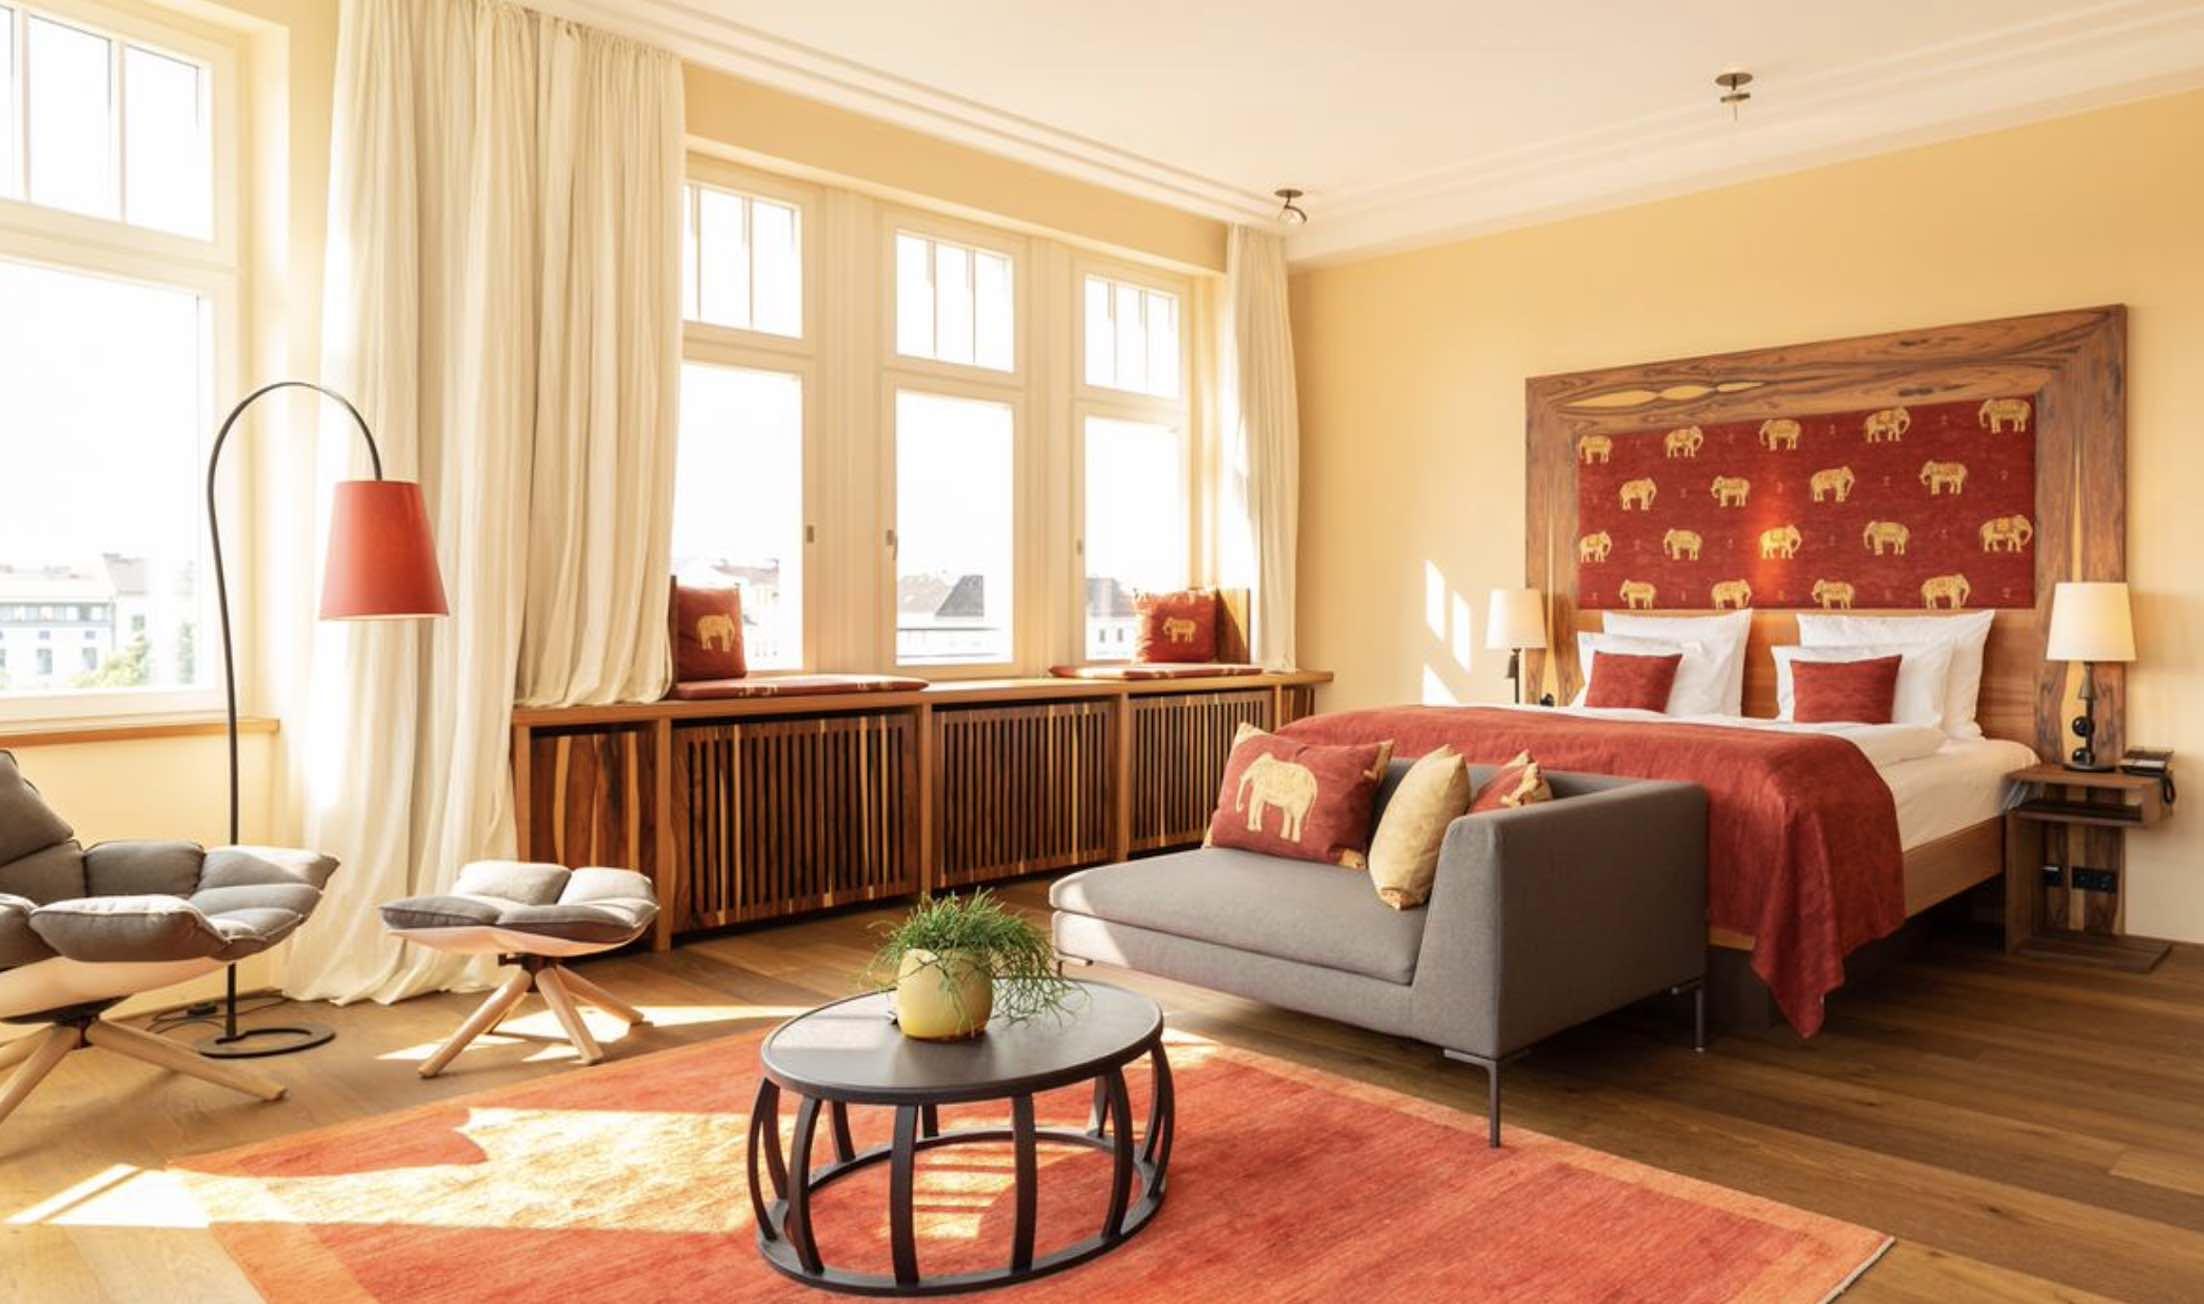 Orania.Berlin luxury bedroom with big windows